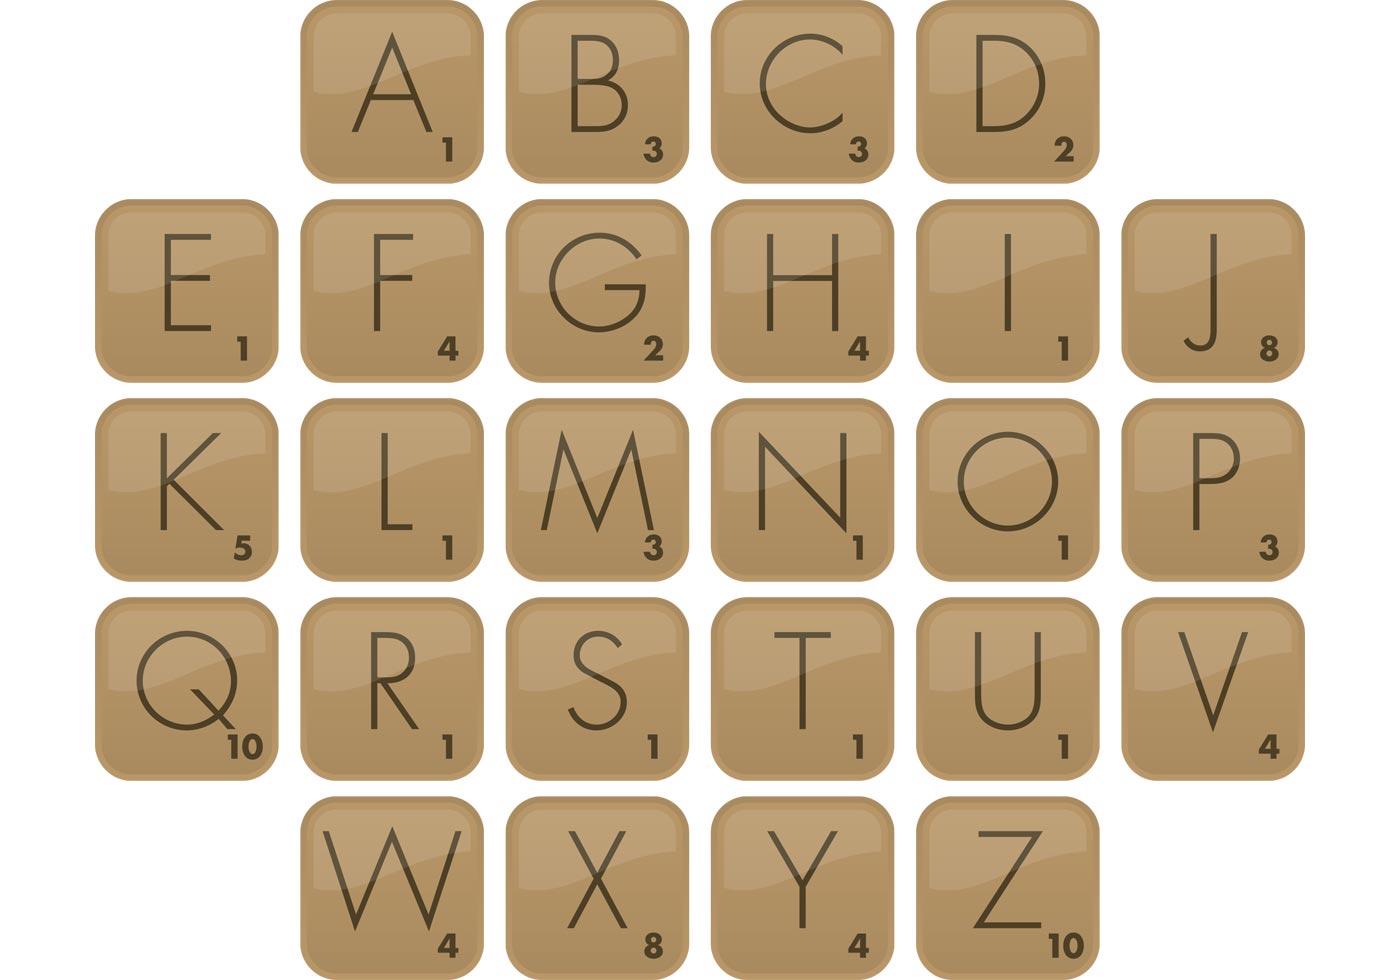 Scrabble Font Free Vector Art - (11 Free Downloads)